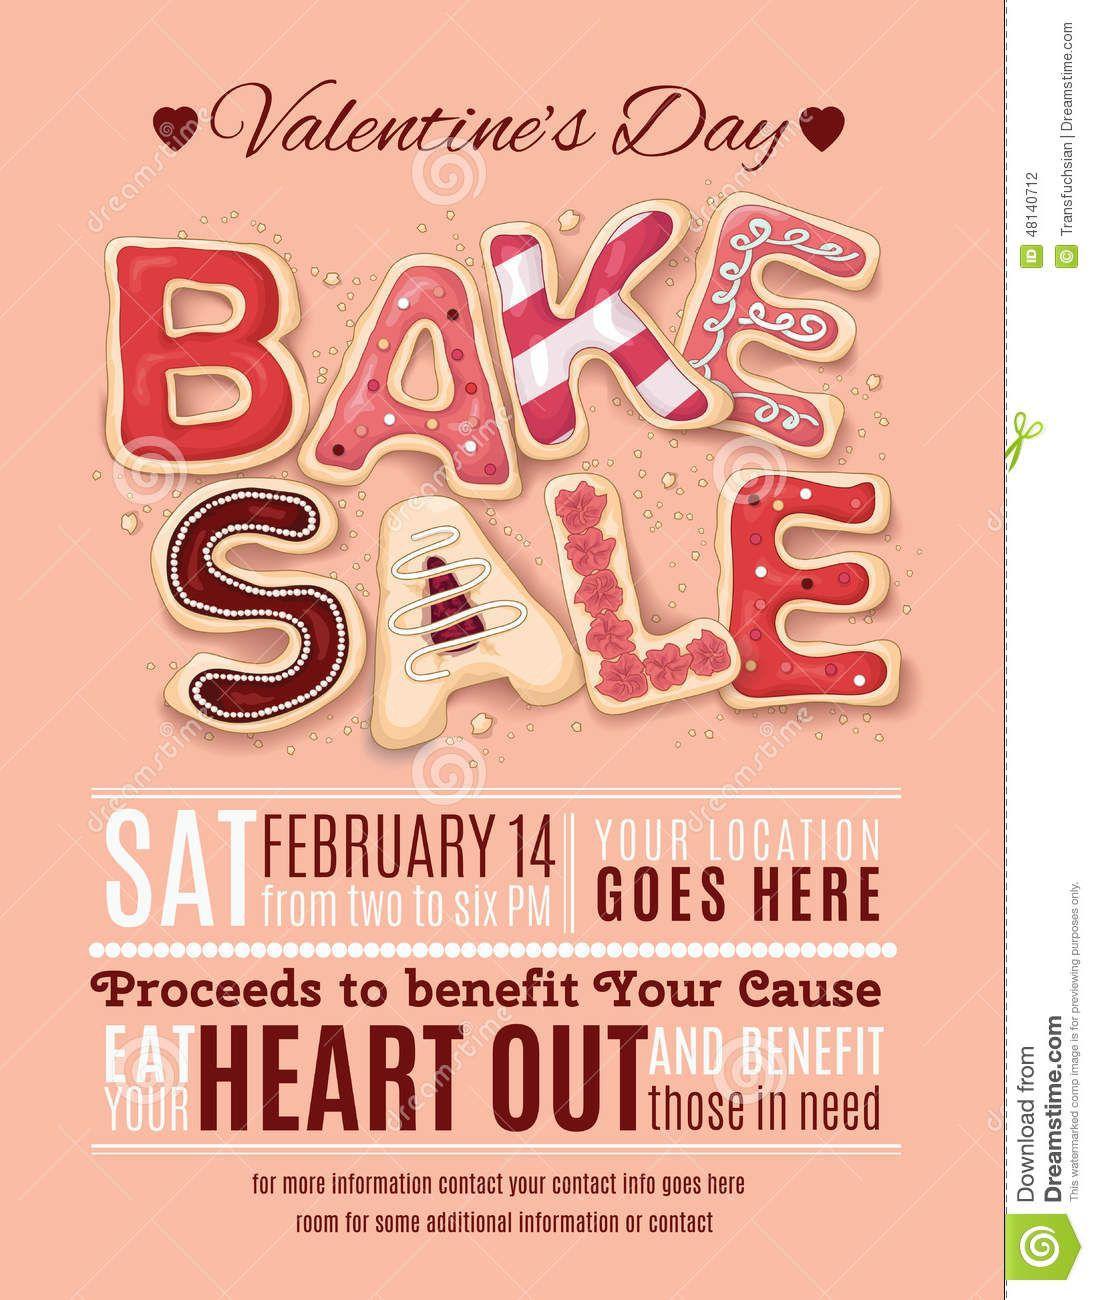 000 Wonderful Valentine Bake Sale Flyer Template Free Example  Valentine'Full